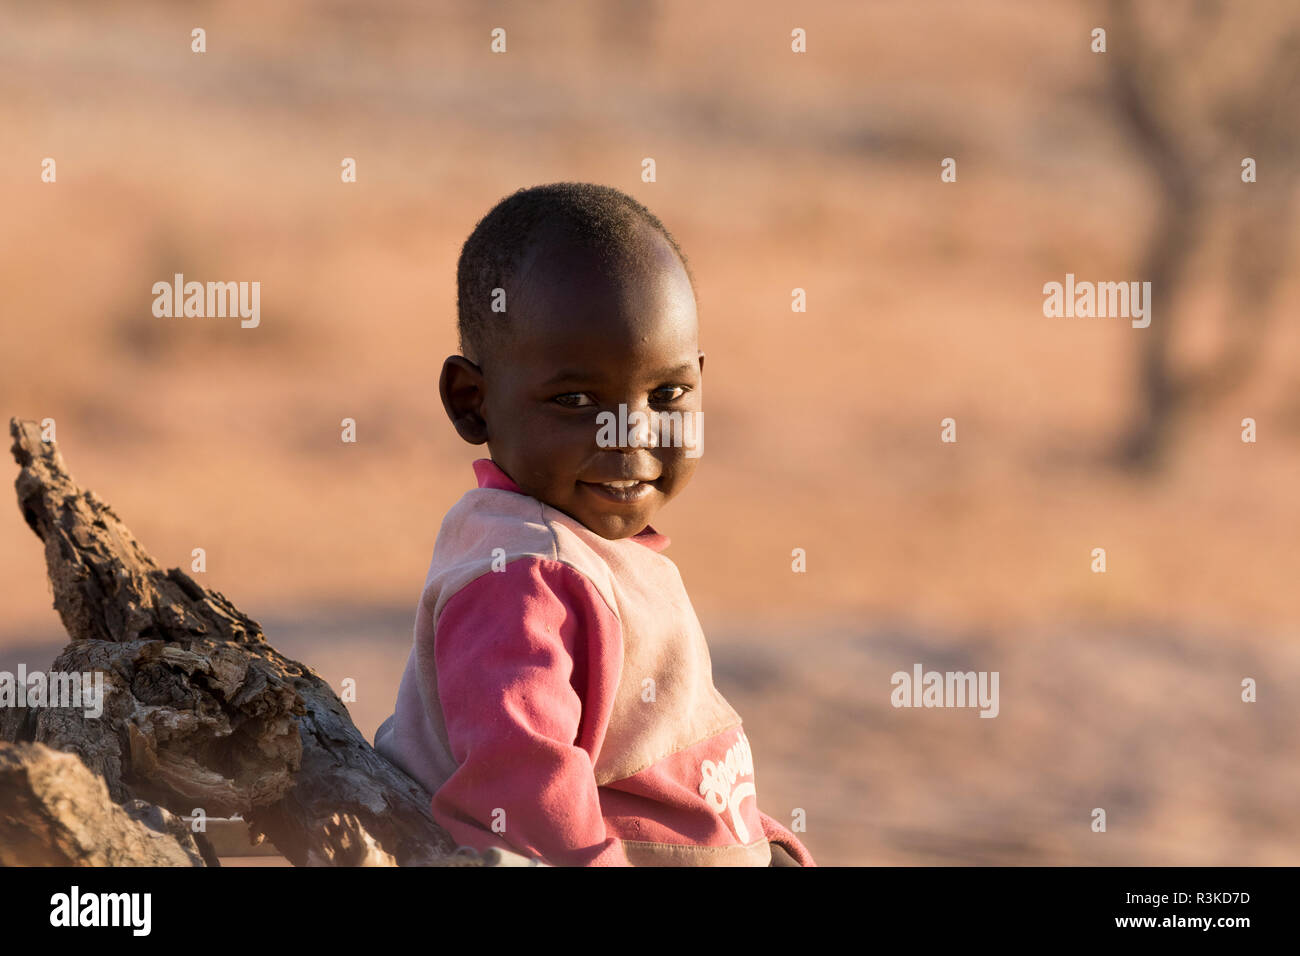 Africa, Namibia, Damaraland. Portrait of young boy. Credit as: Wendy Kaveney / Jaynes Gallery / DanitaDelimont.com Stock Photo